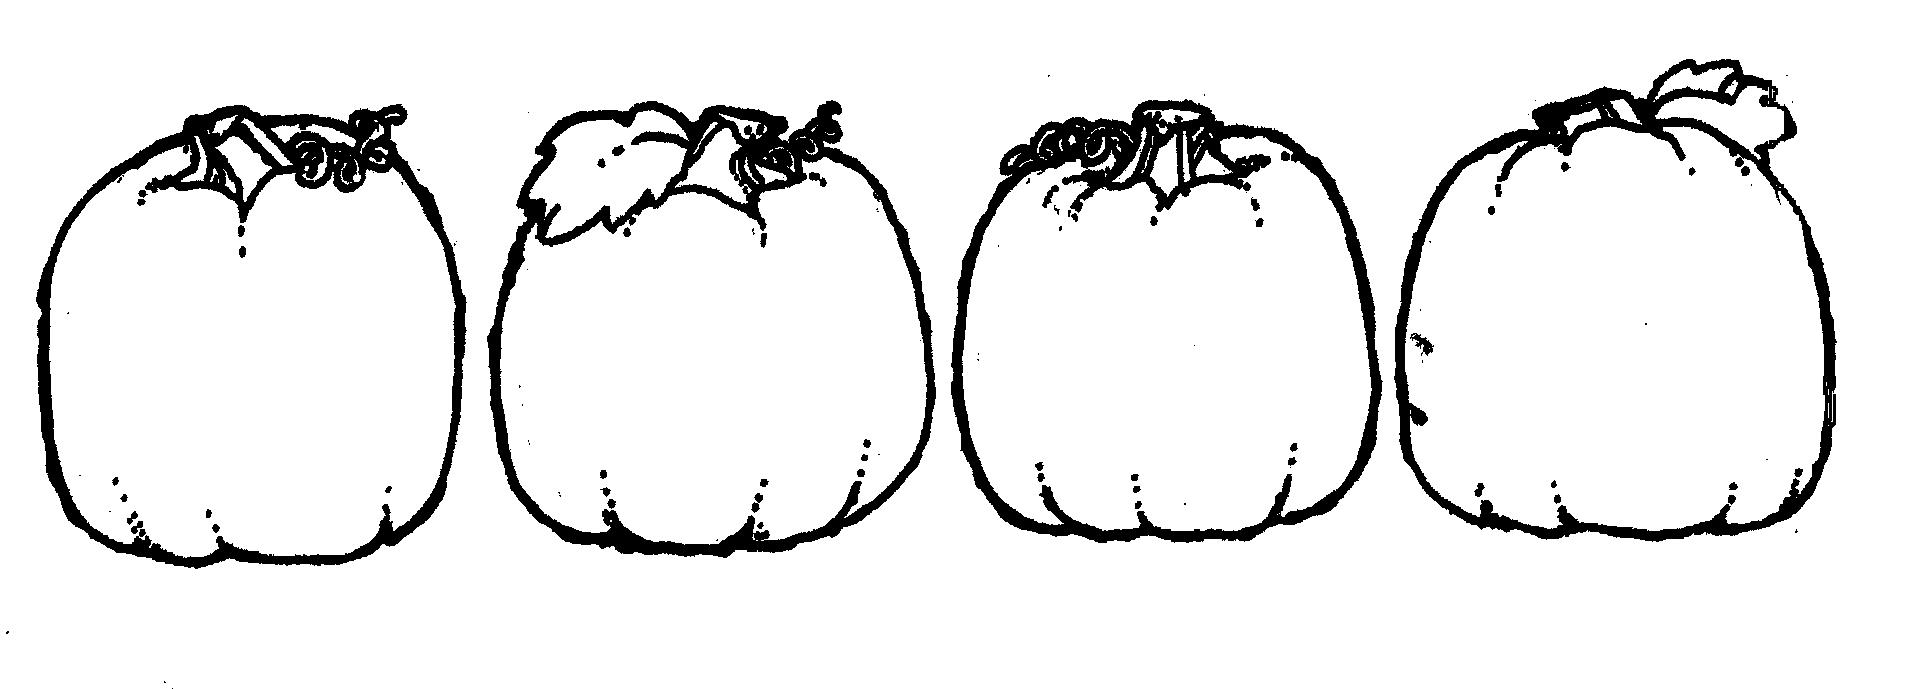 1920x689 Pumpkin Black And White Pumpkin Outline Clipart Black And White